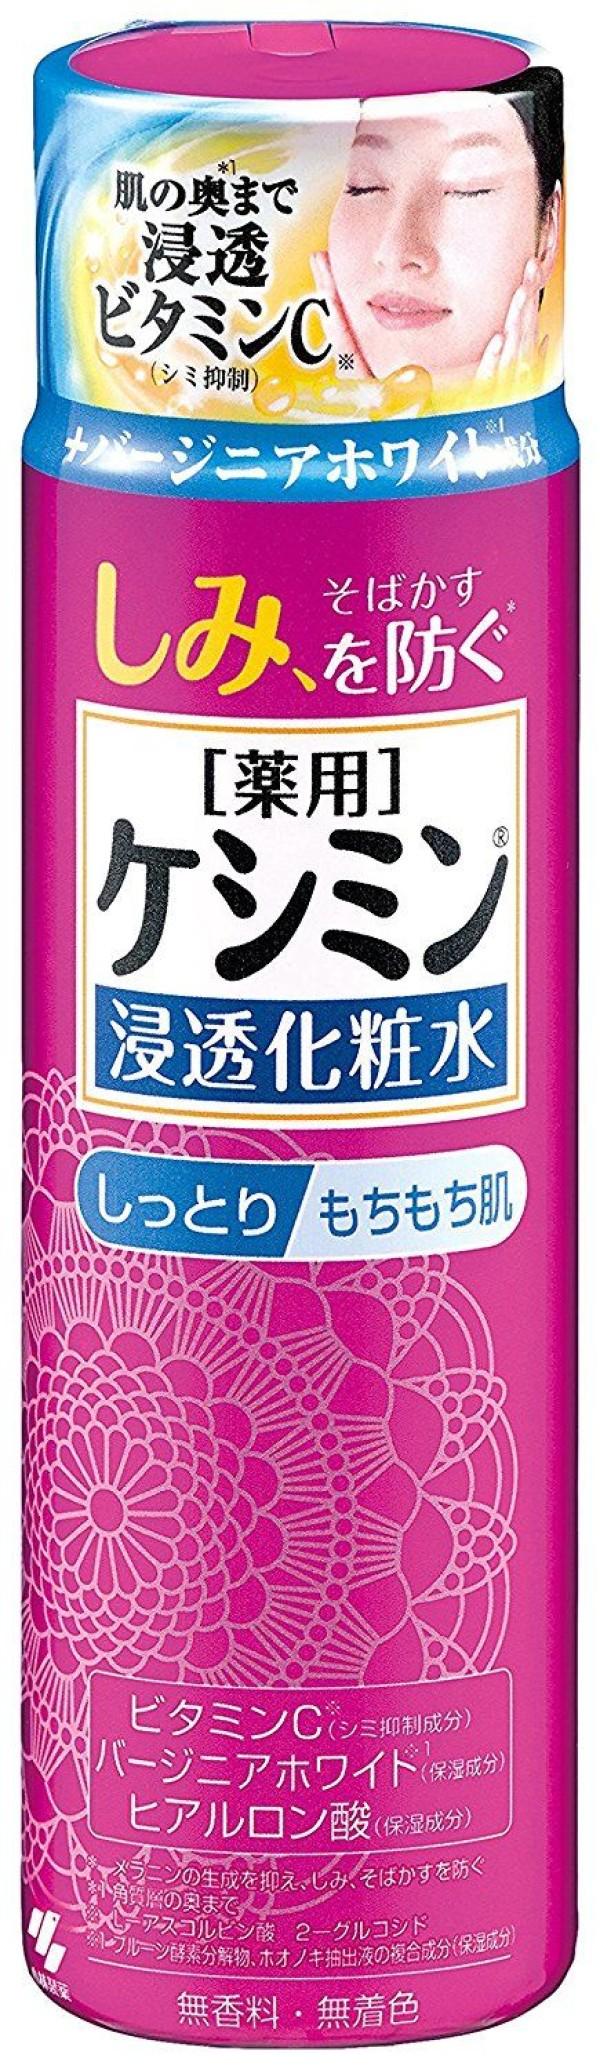 Отбеливающий лосьон от веснушек и пигментных пятен Kobayashi Pharmaceutical Keshin Penetration Lotion